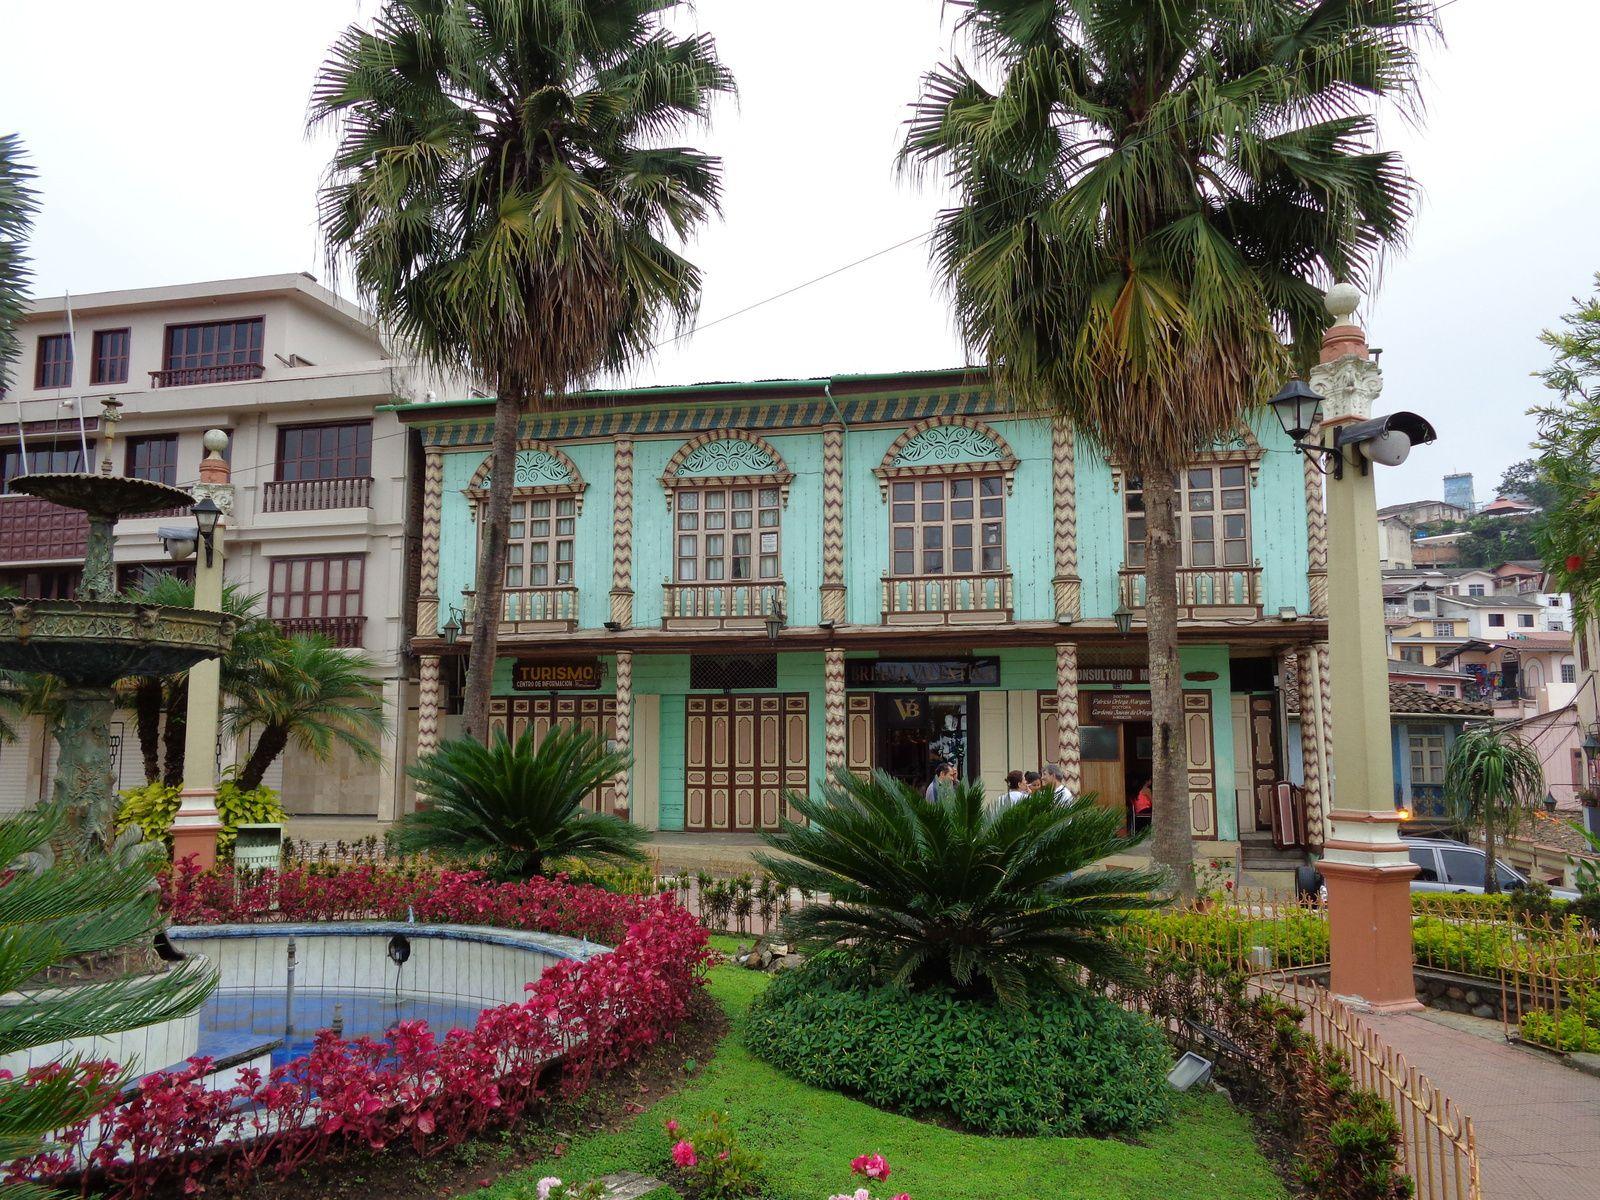 Petite boucle sud Ecuador/nord Peru